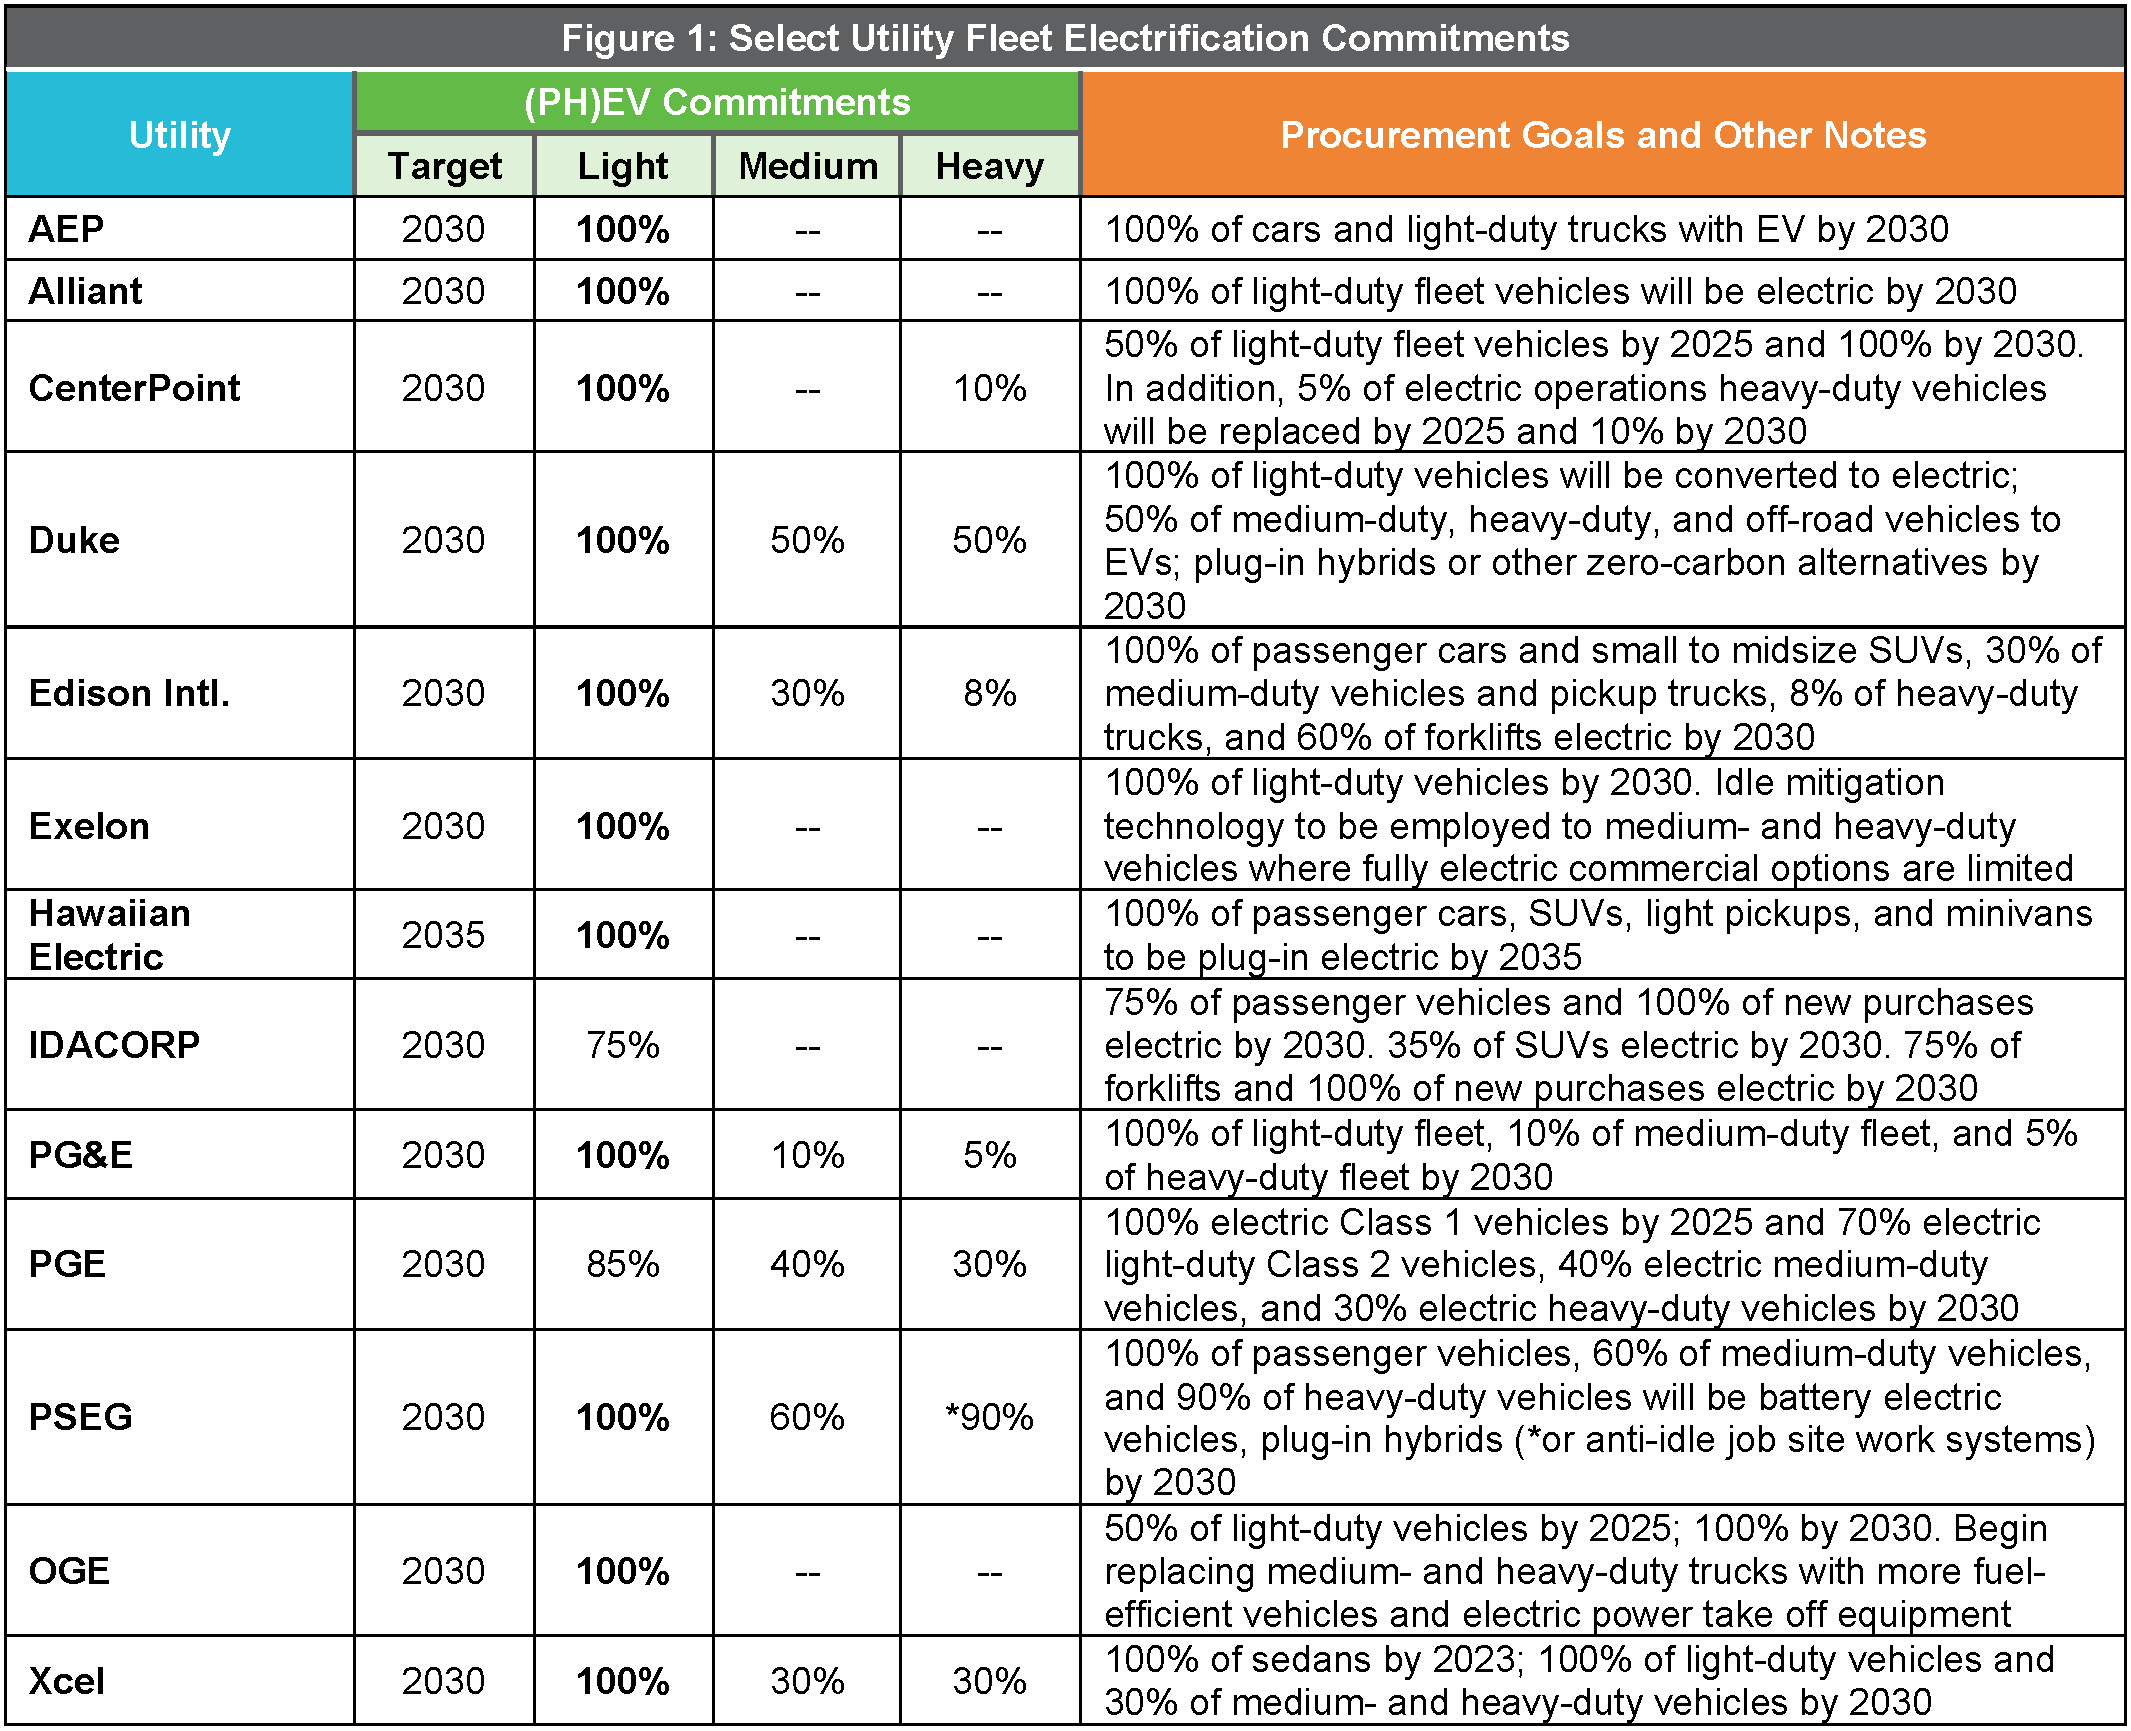 Select Utility Fleet Electrification Commitments: Utilities: AEP, Alliant, Duke, Edison Intl., Exelon. (PH)EV Commitments, Procurement goals and other notes